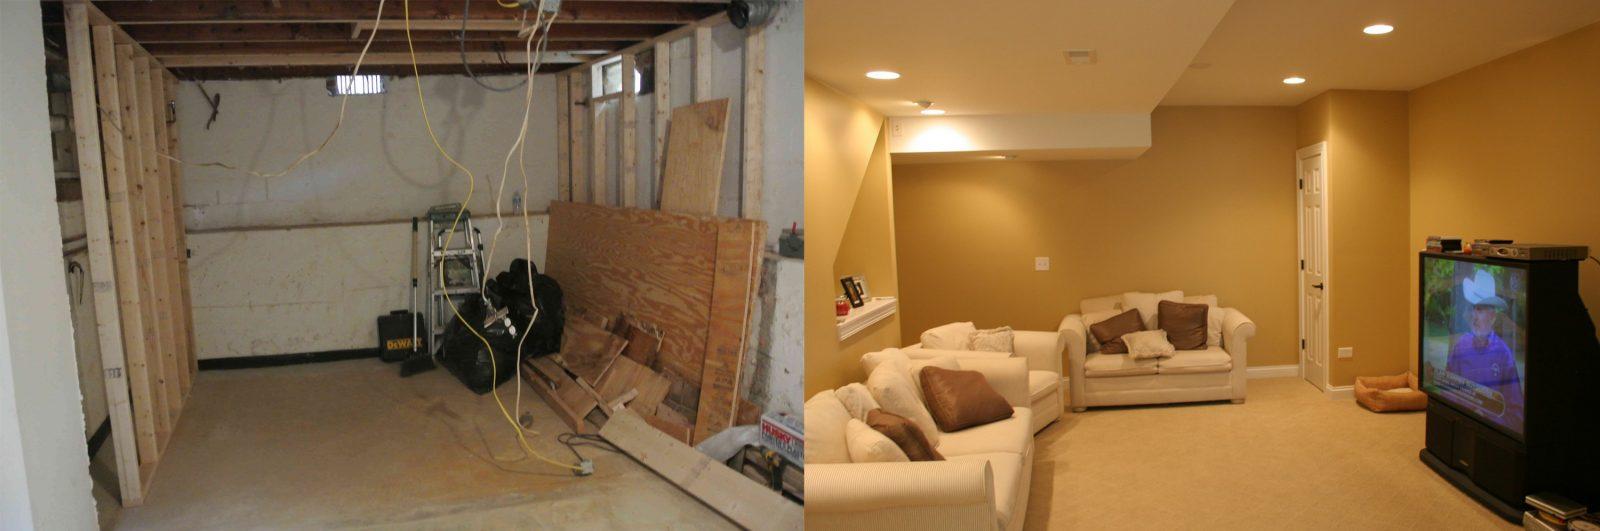 chicago basement remodeling. Before-after-4 Chicago Basement Remodeling